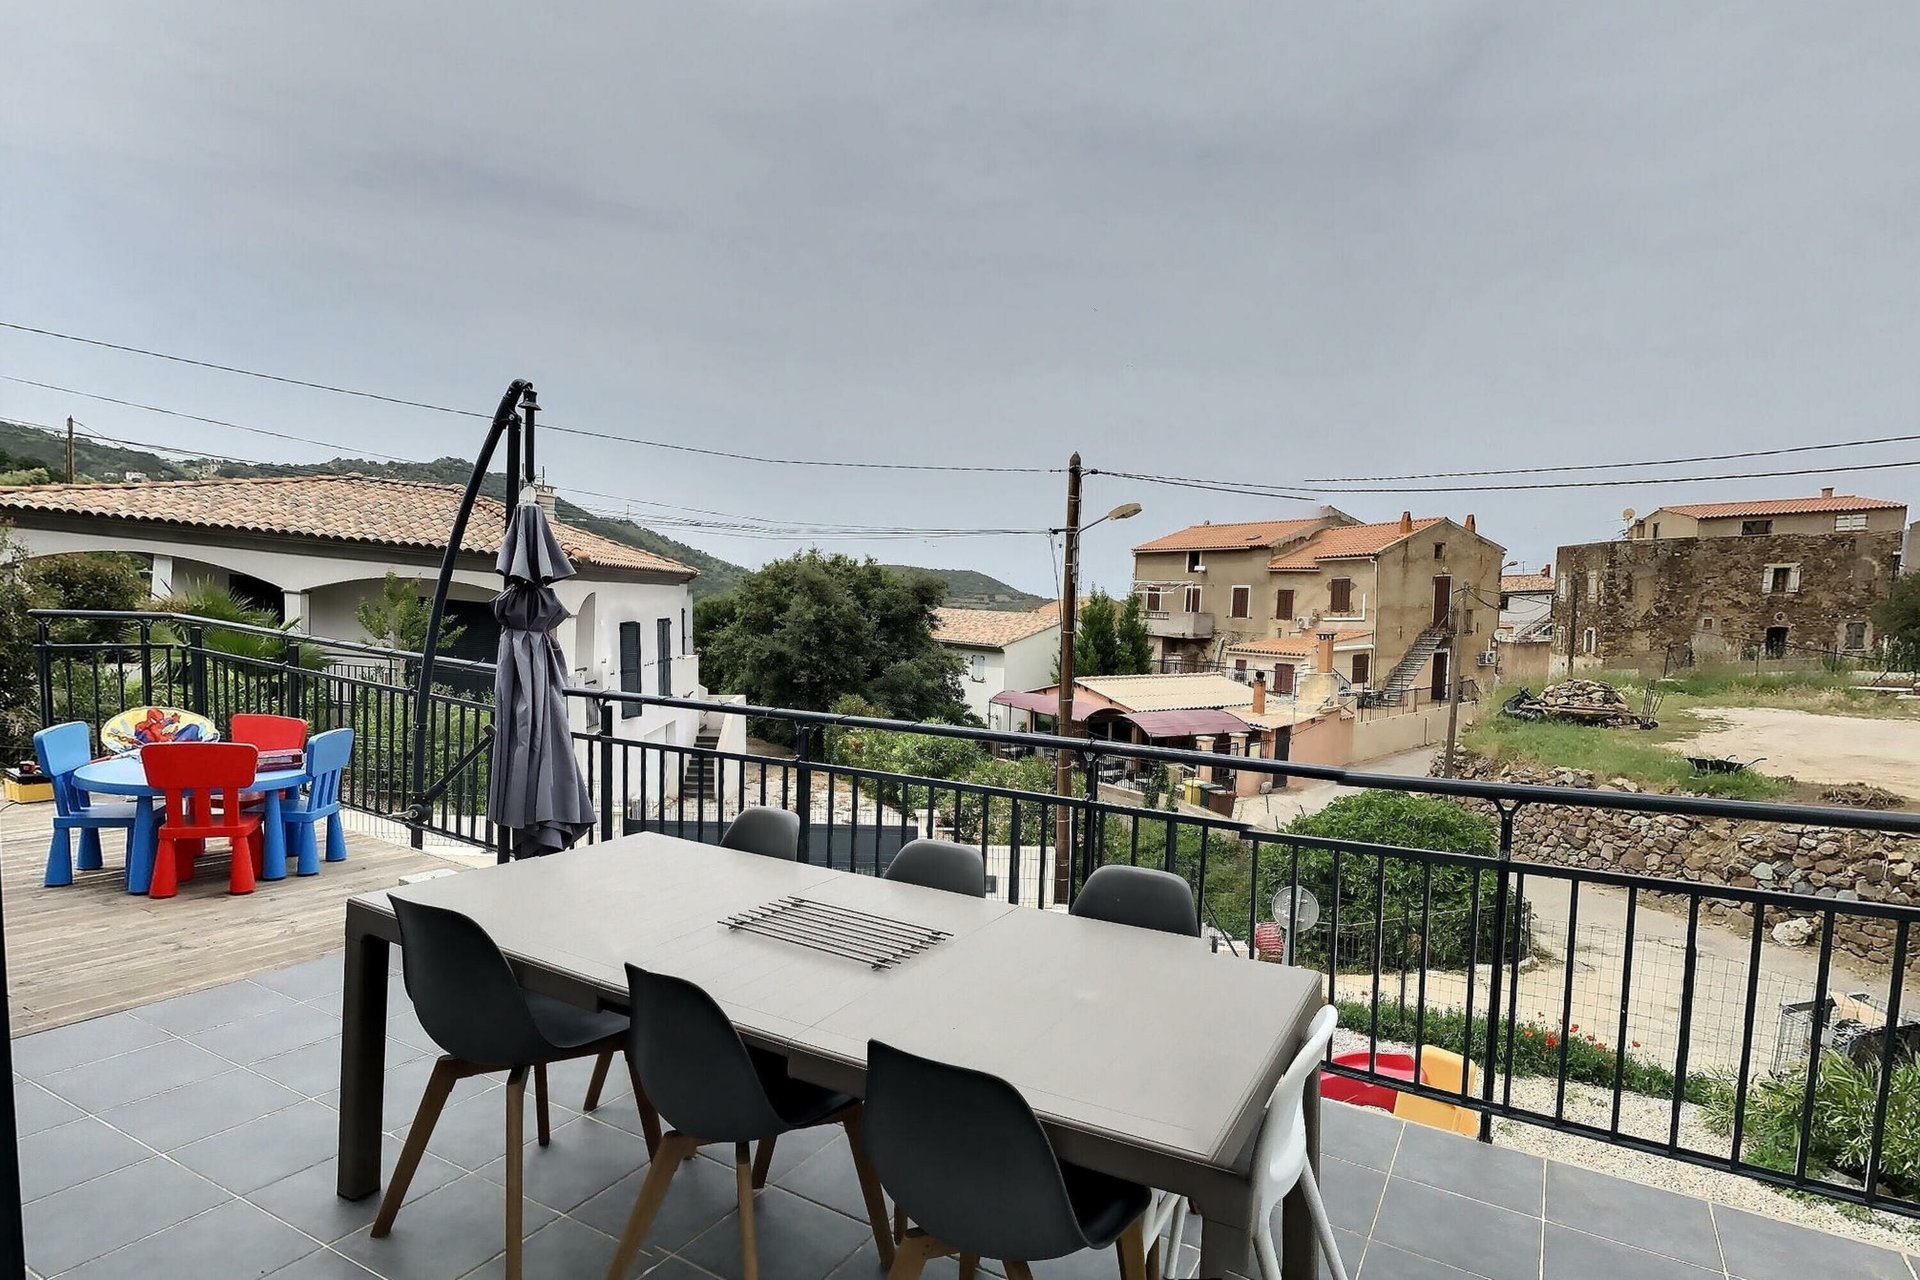 Maison 4 pièces - Calenzana